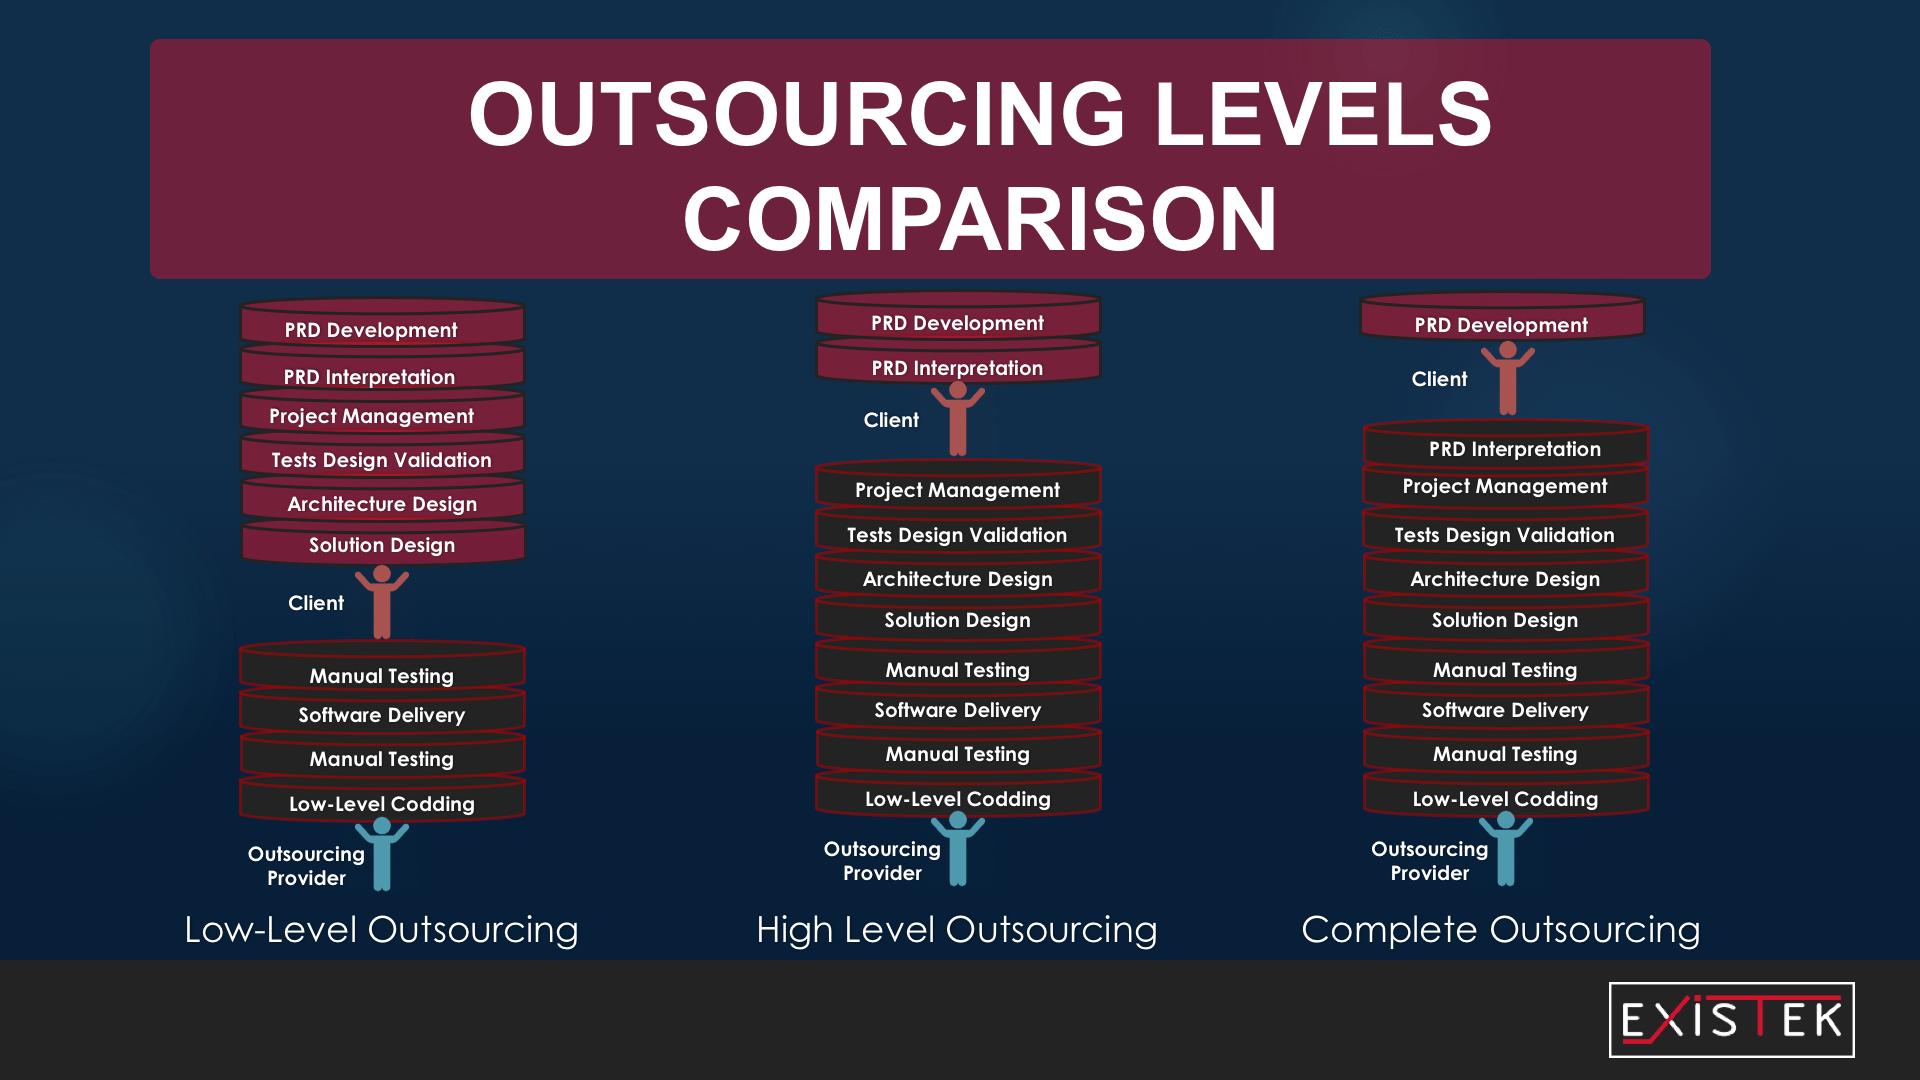 offshore software development model by levels illustration